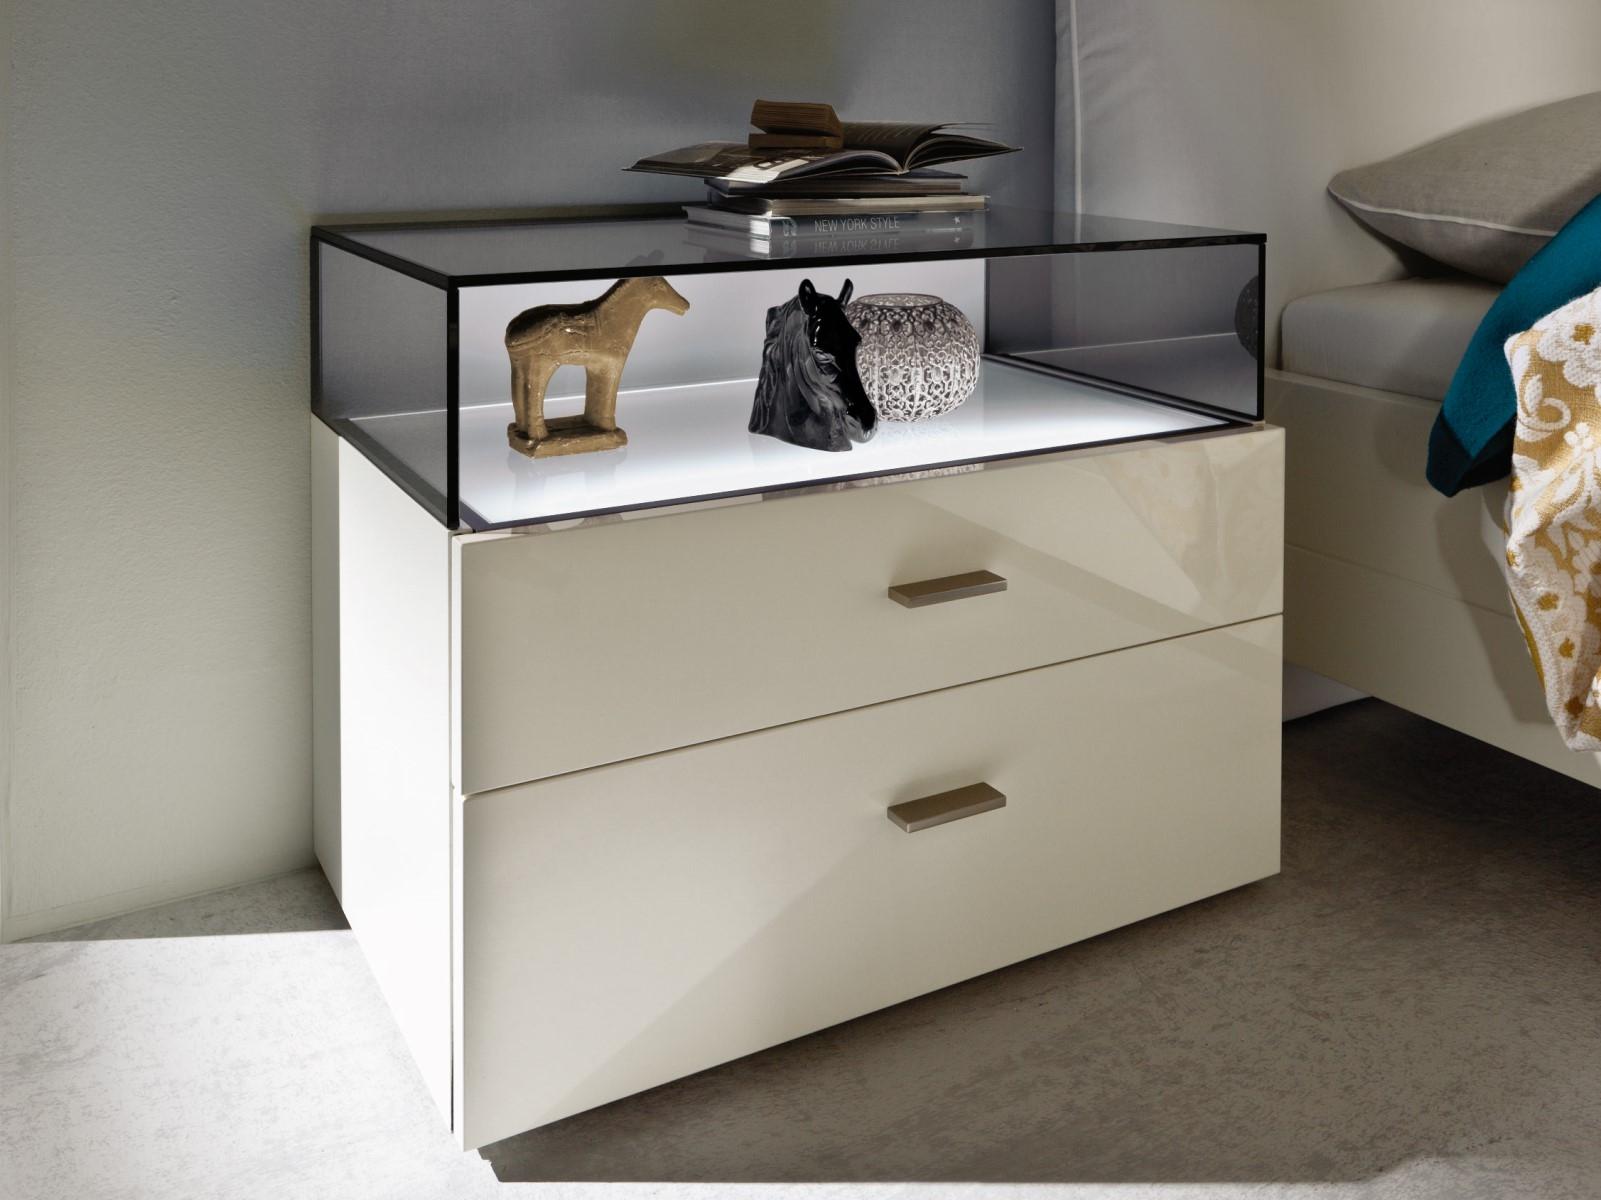 h lsta now jjeliszekr ny veg vitrinnel innoshop innoshop megfizethet design. Black Bedroom Furniture Sets. Home Design Ideas